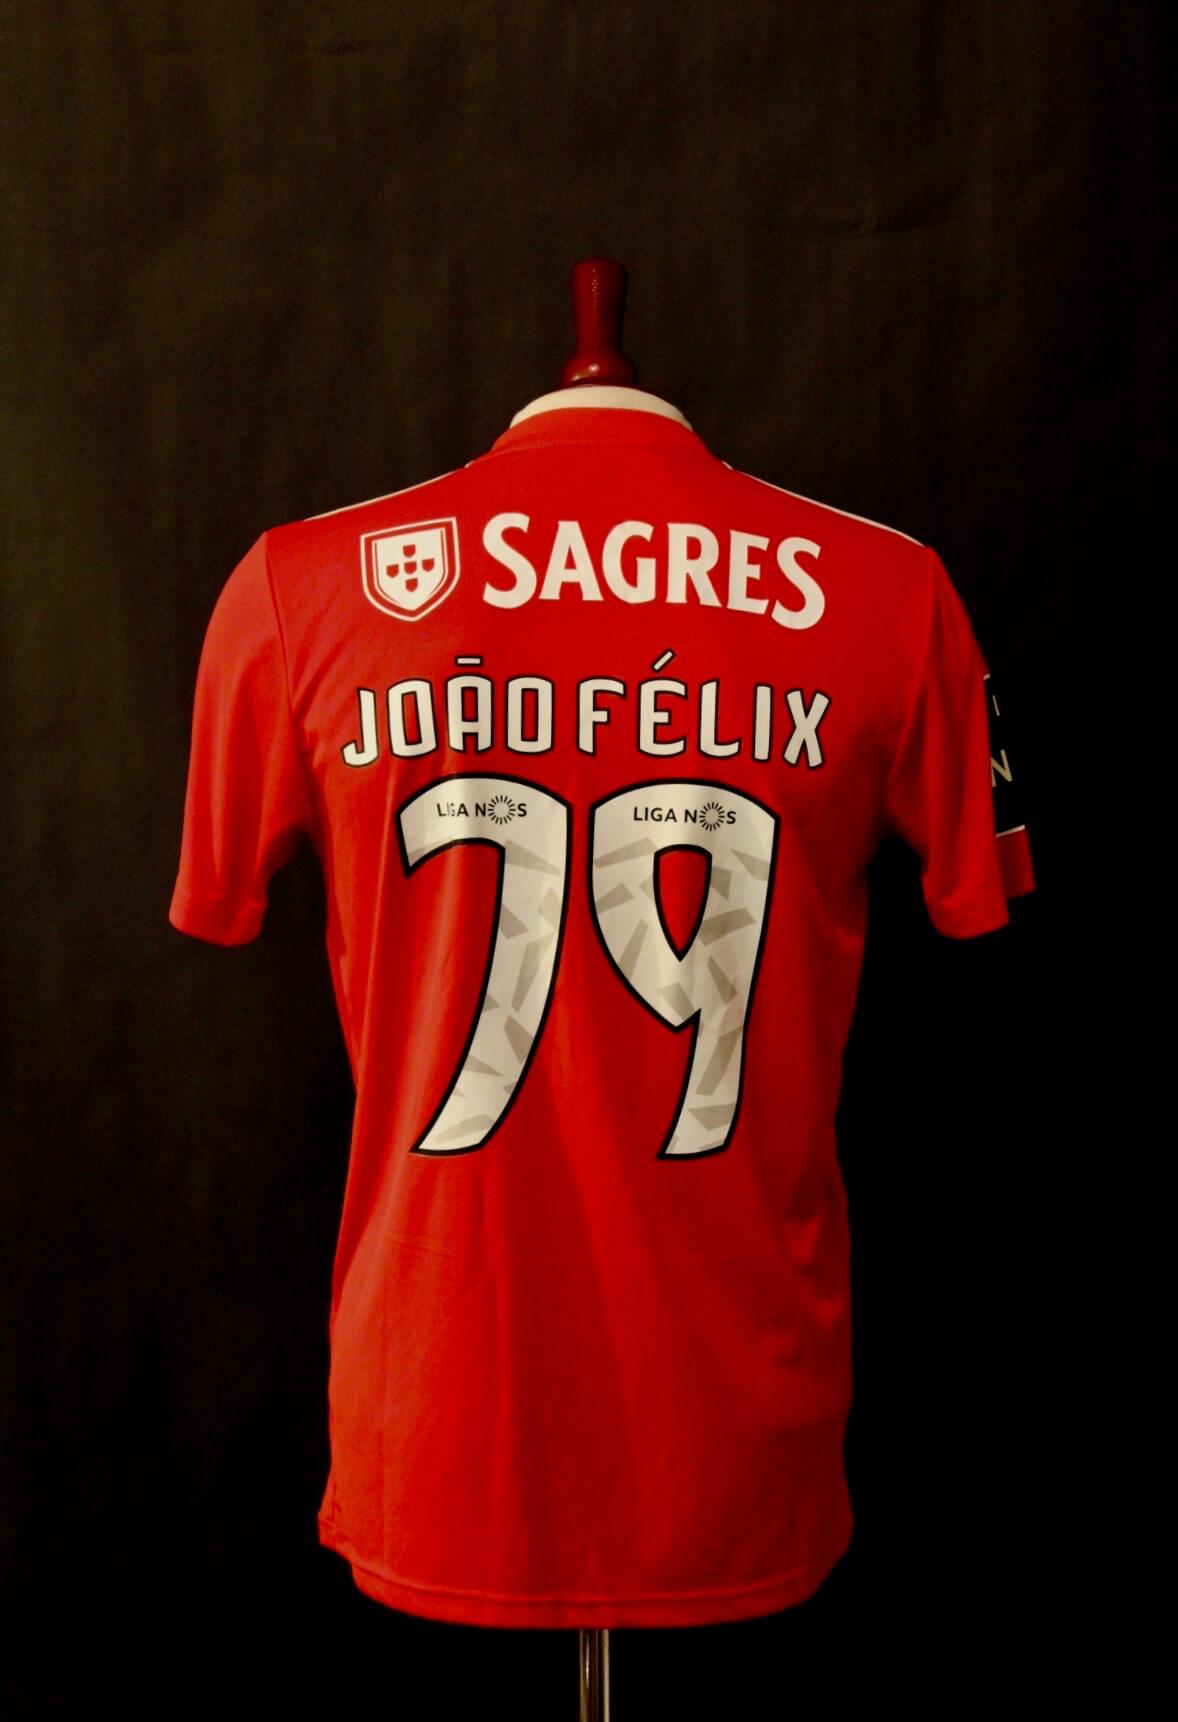 huge selection of 7b803 3ac07 Joao Felix Game-Used #79 Benfica Home Shirt. 2018/19.